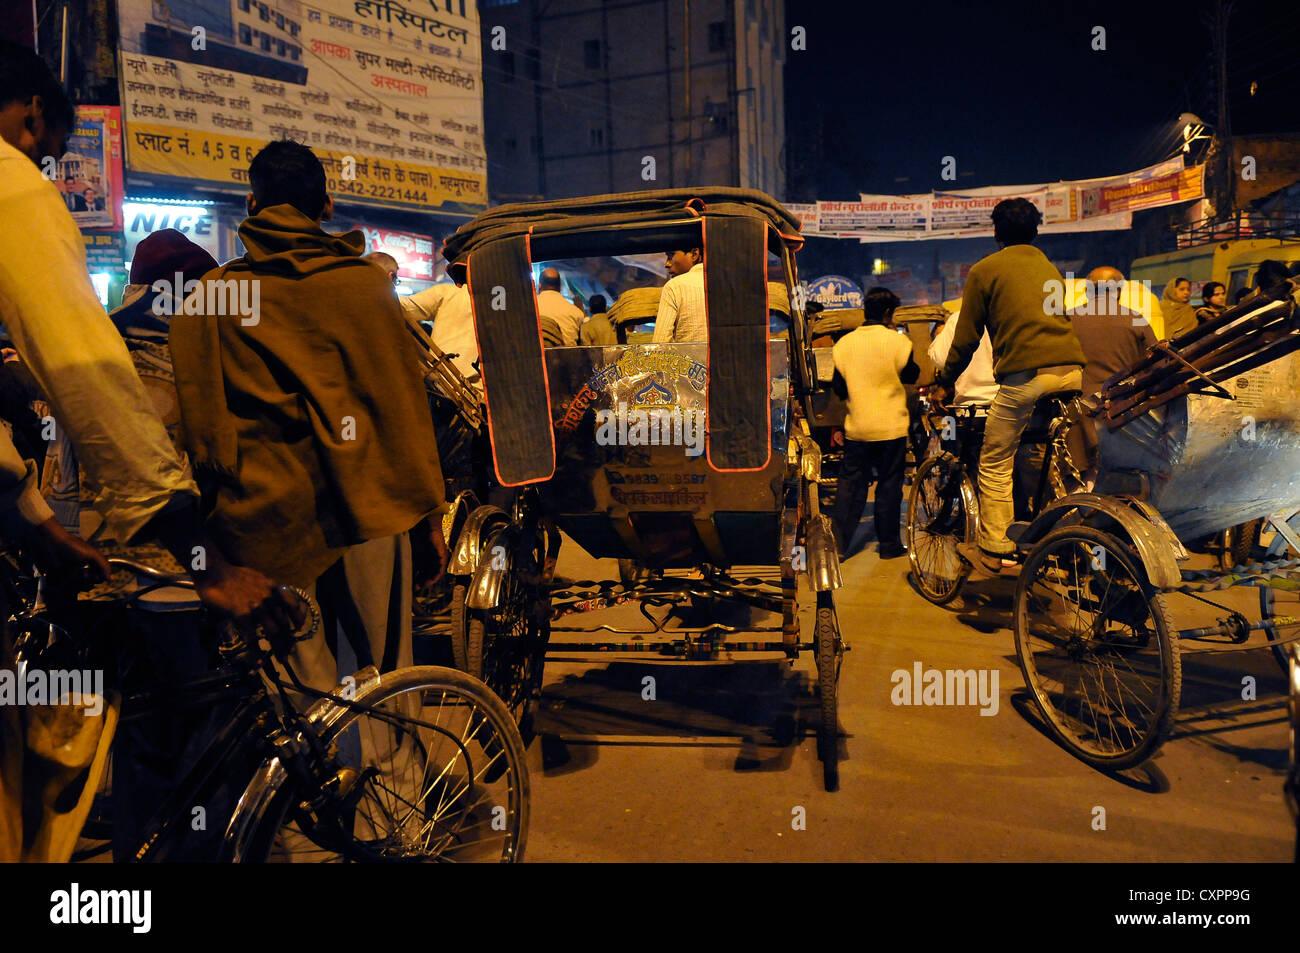 Asia India Uttar Pradesh Varanasi  means of transport in A tiny alley - Stock Image